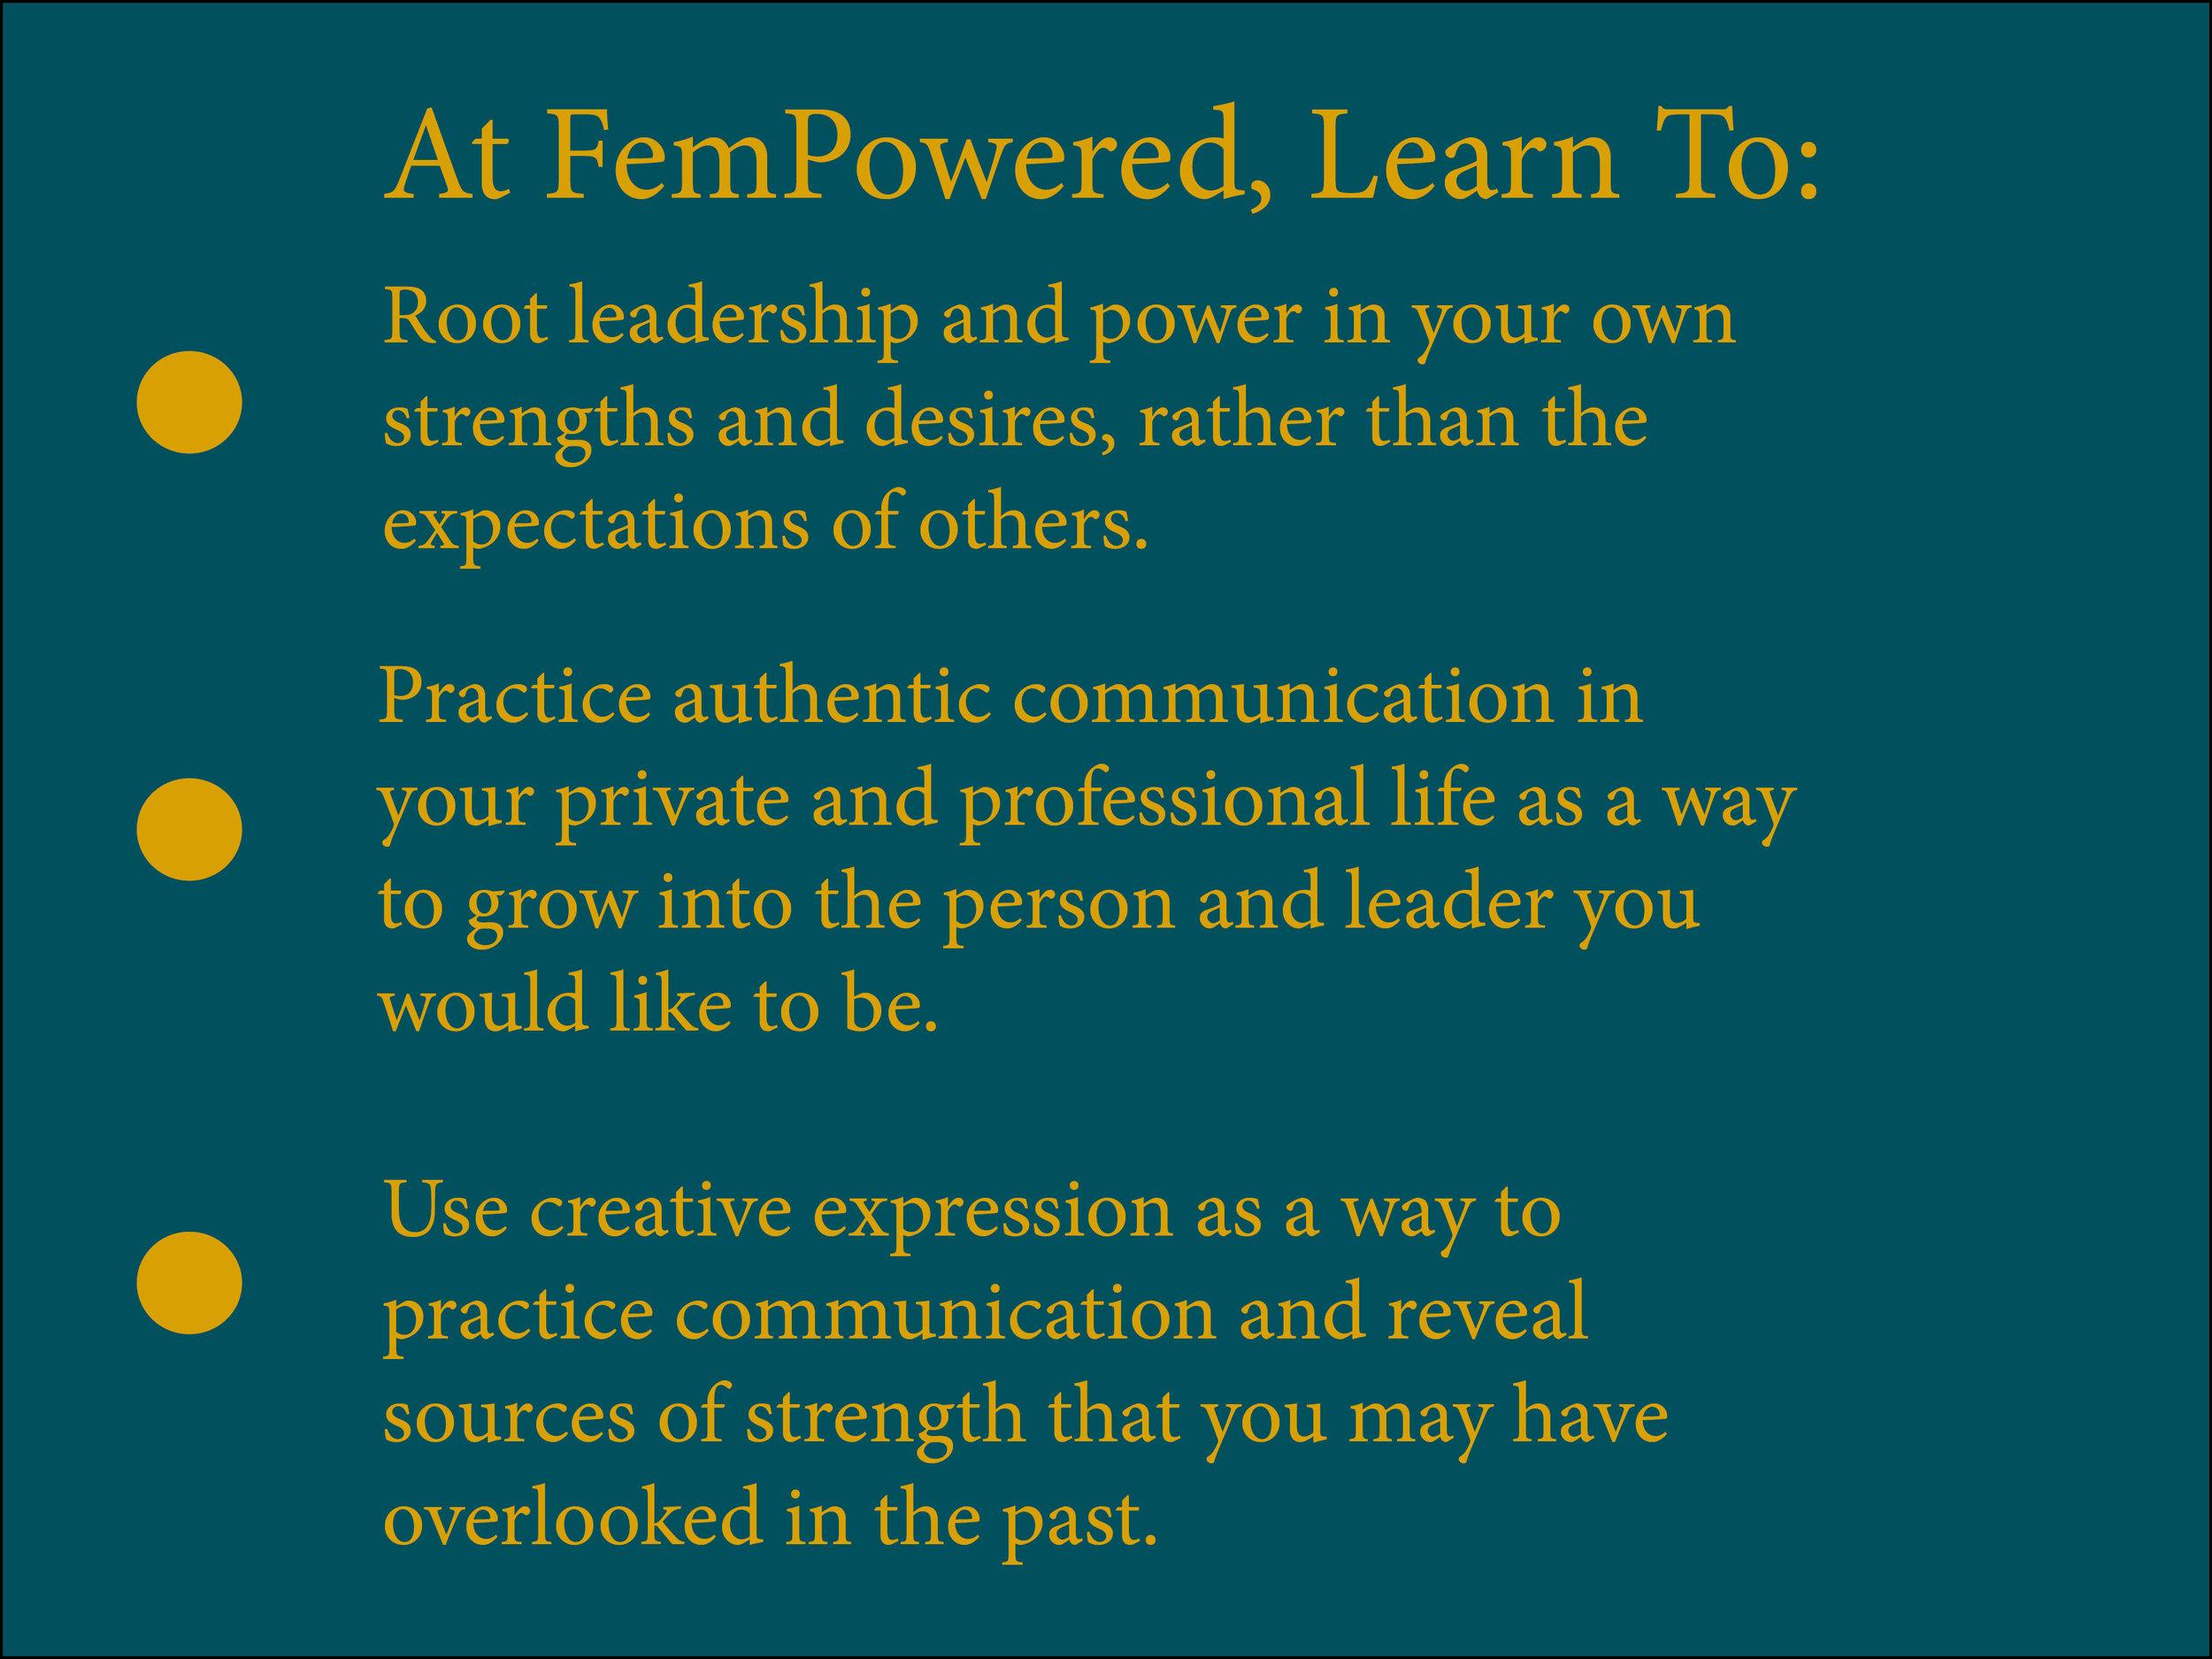 FemPoweredLearnGraphic.jpg